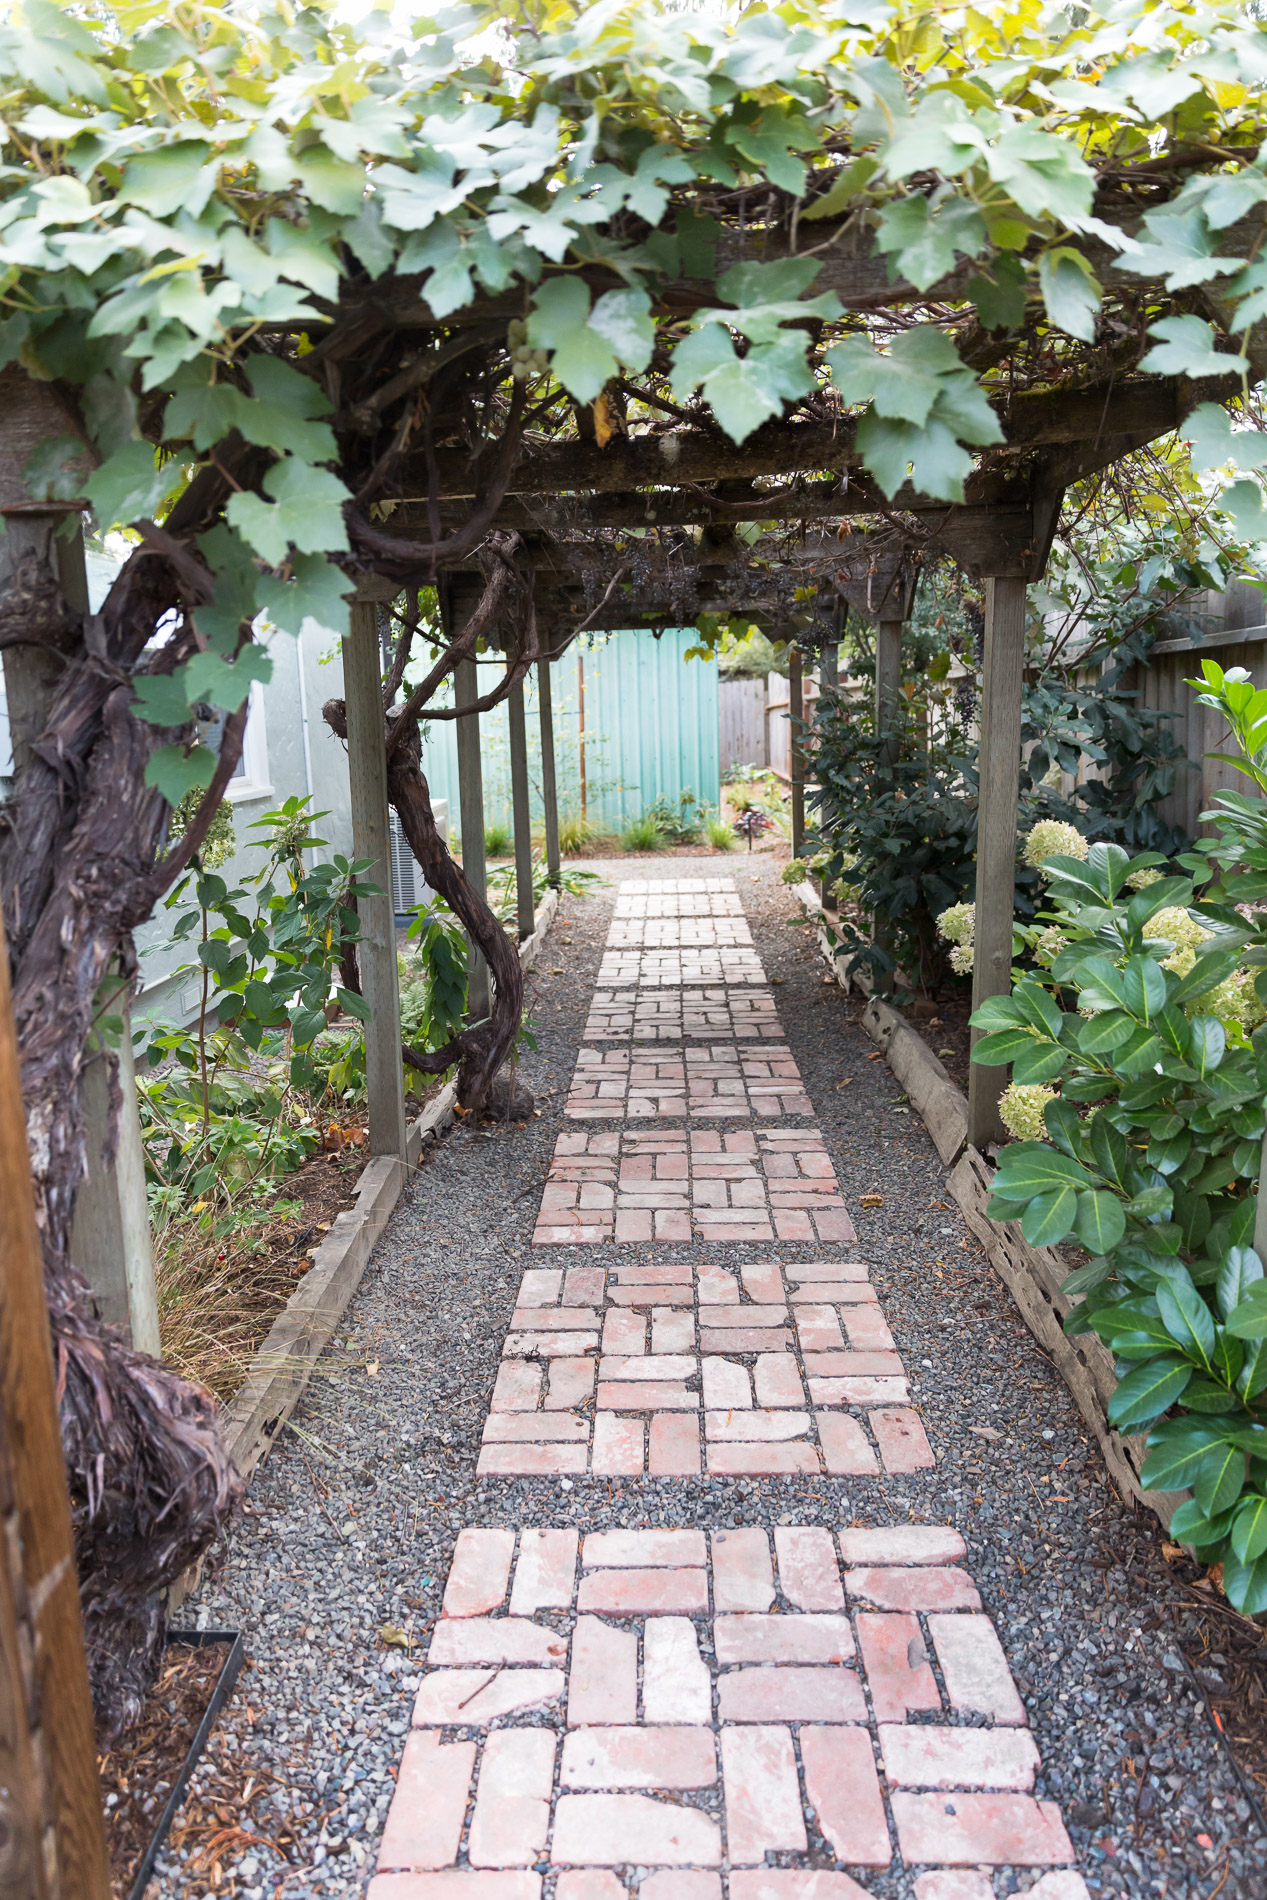 Grape Arbor + Segmented Brick Path